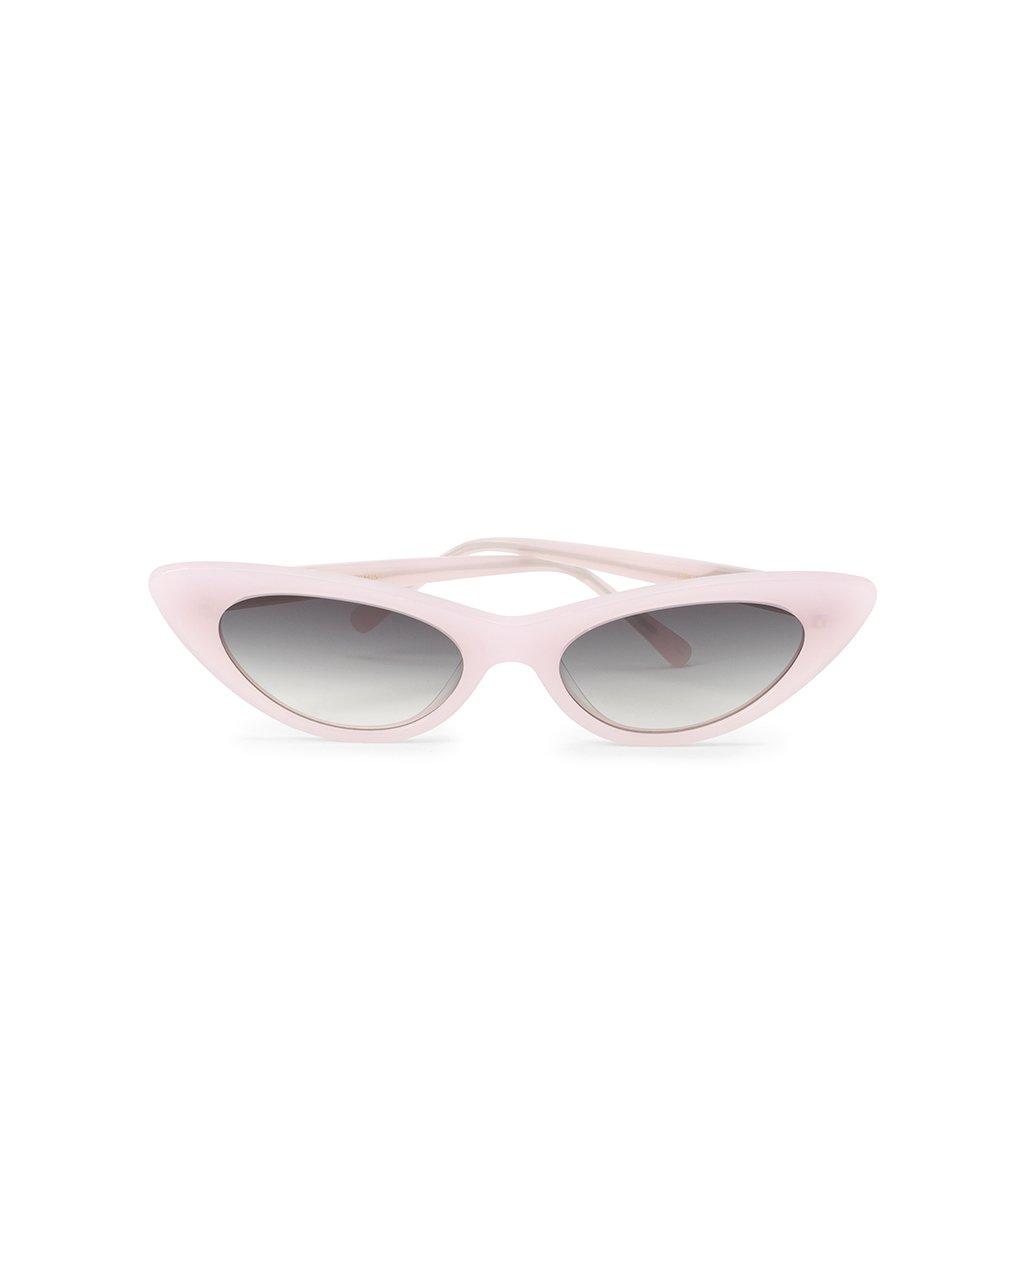 Tiny Glasses